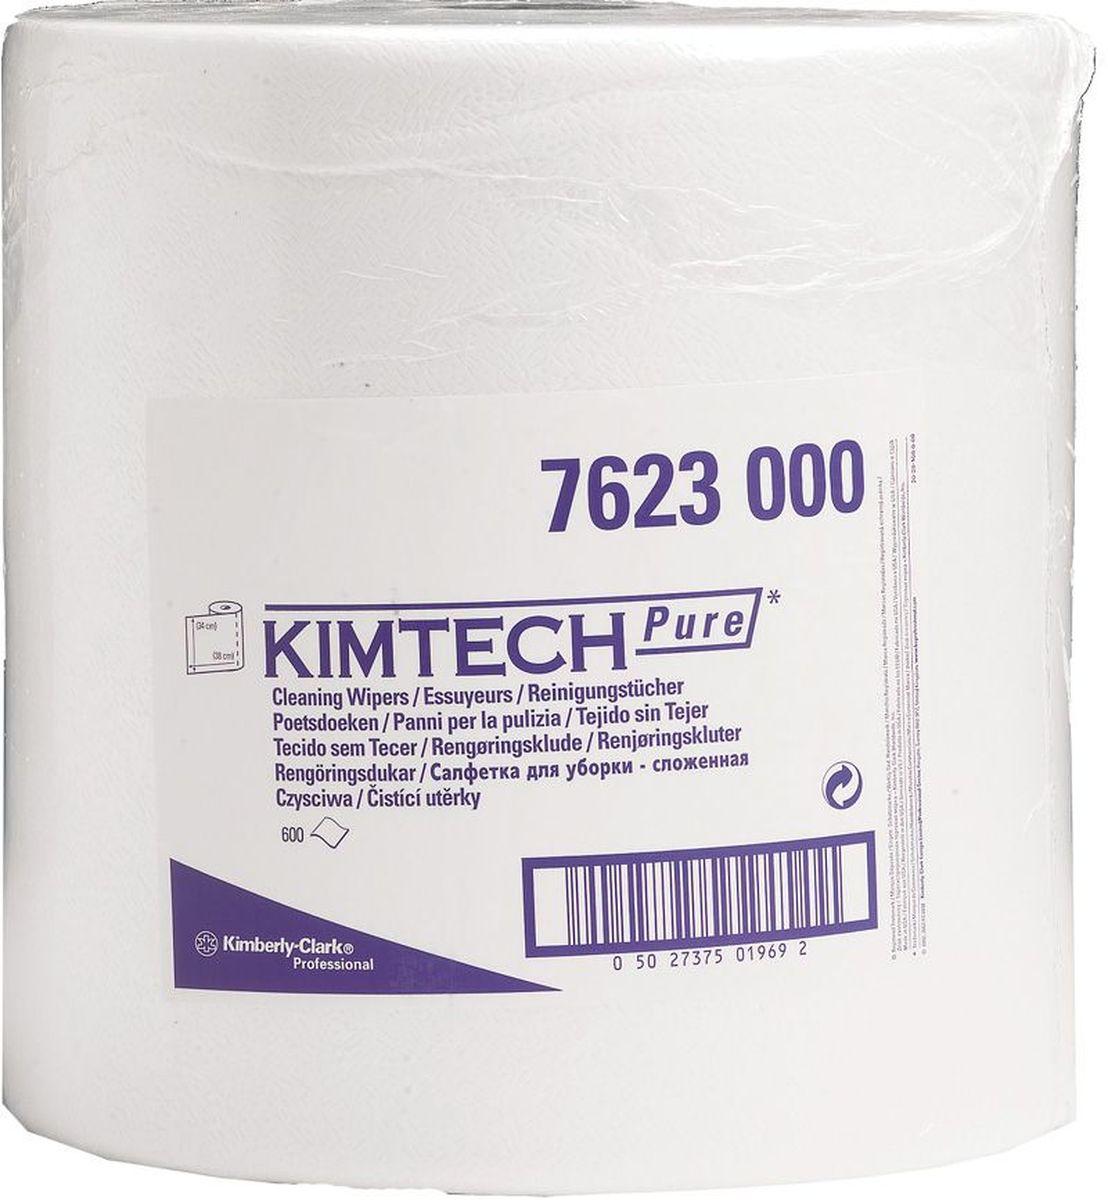 Полотенца бумажные Kimtech  Pure , 600 листов. 7623 - Туалетная бумага, салфетки